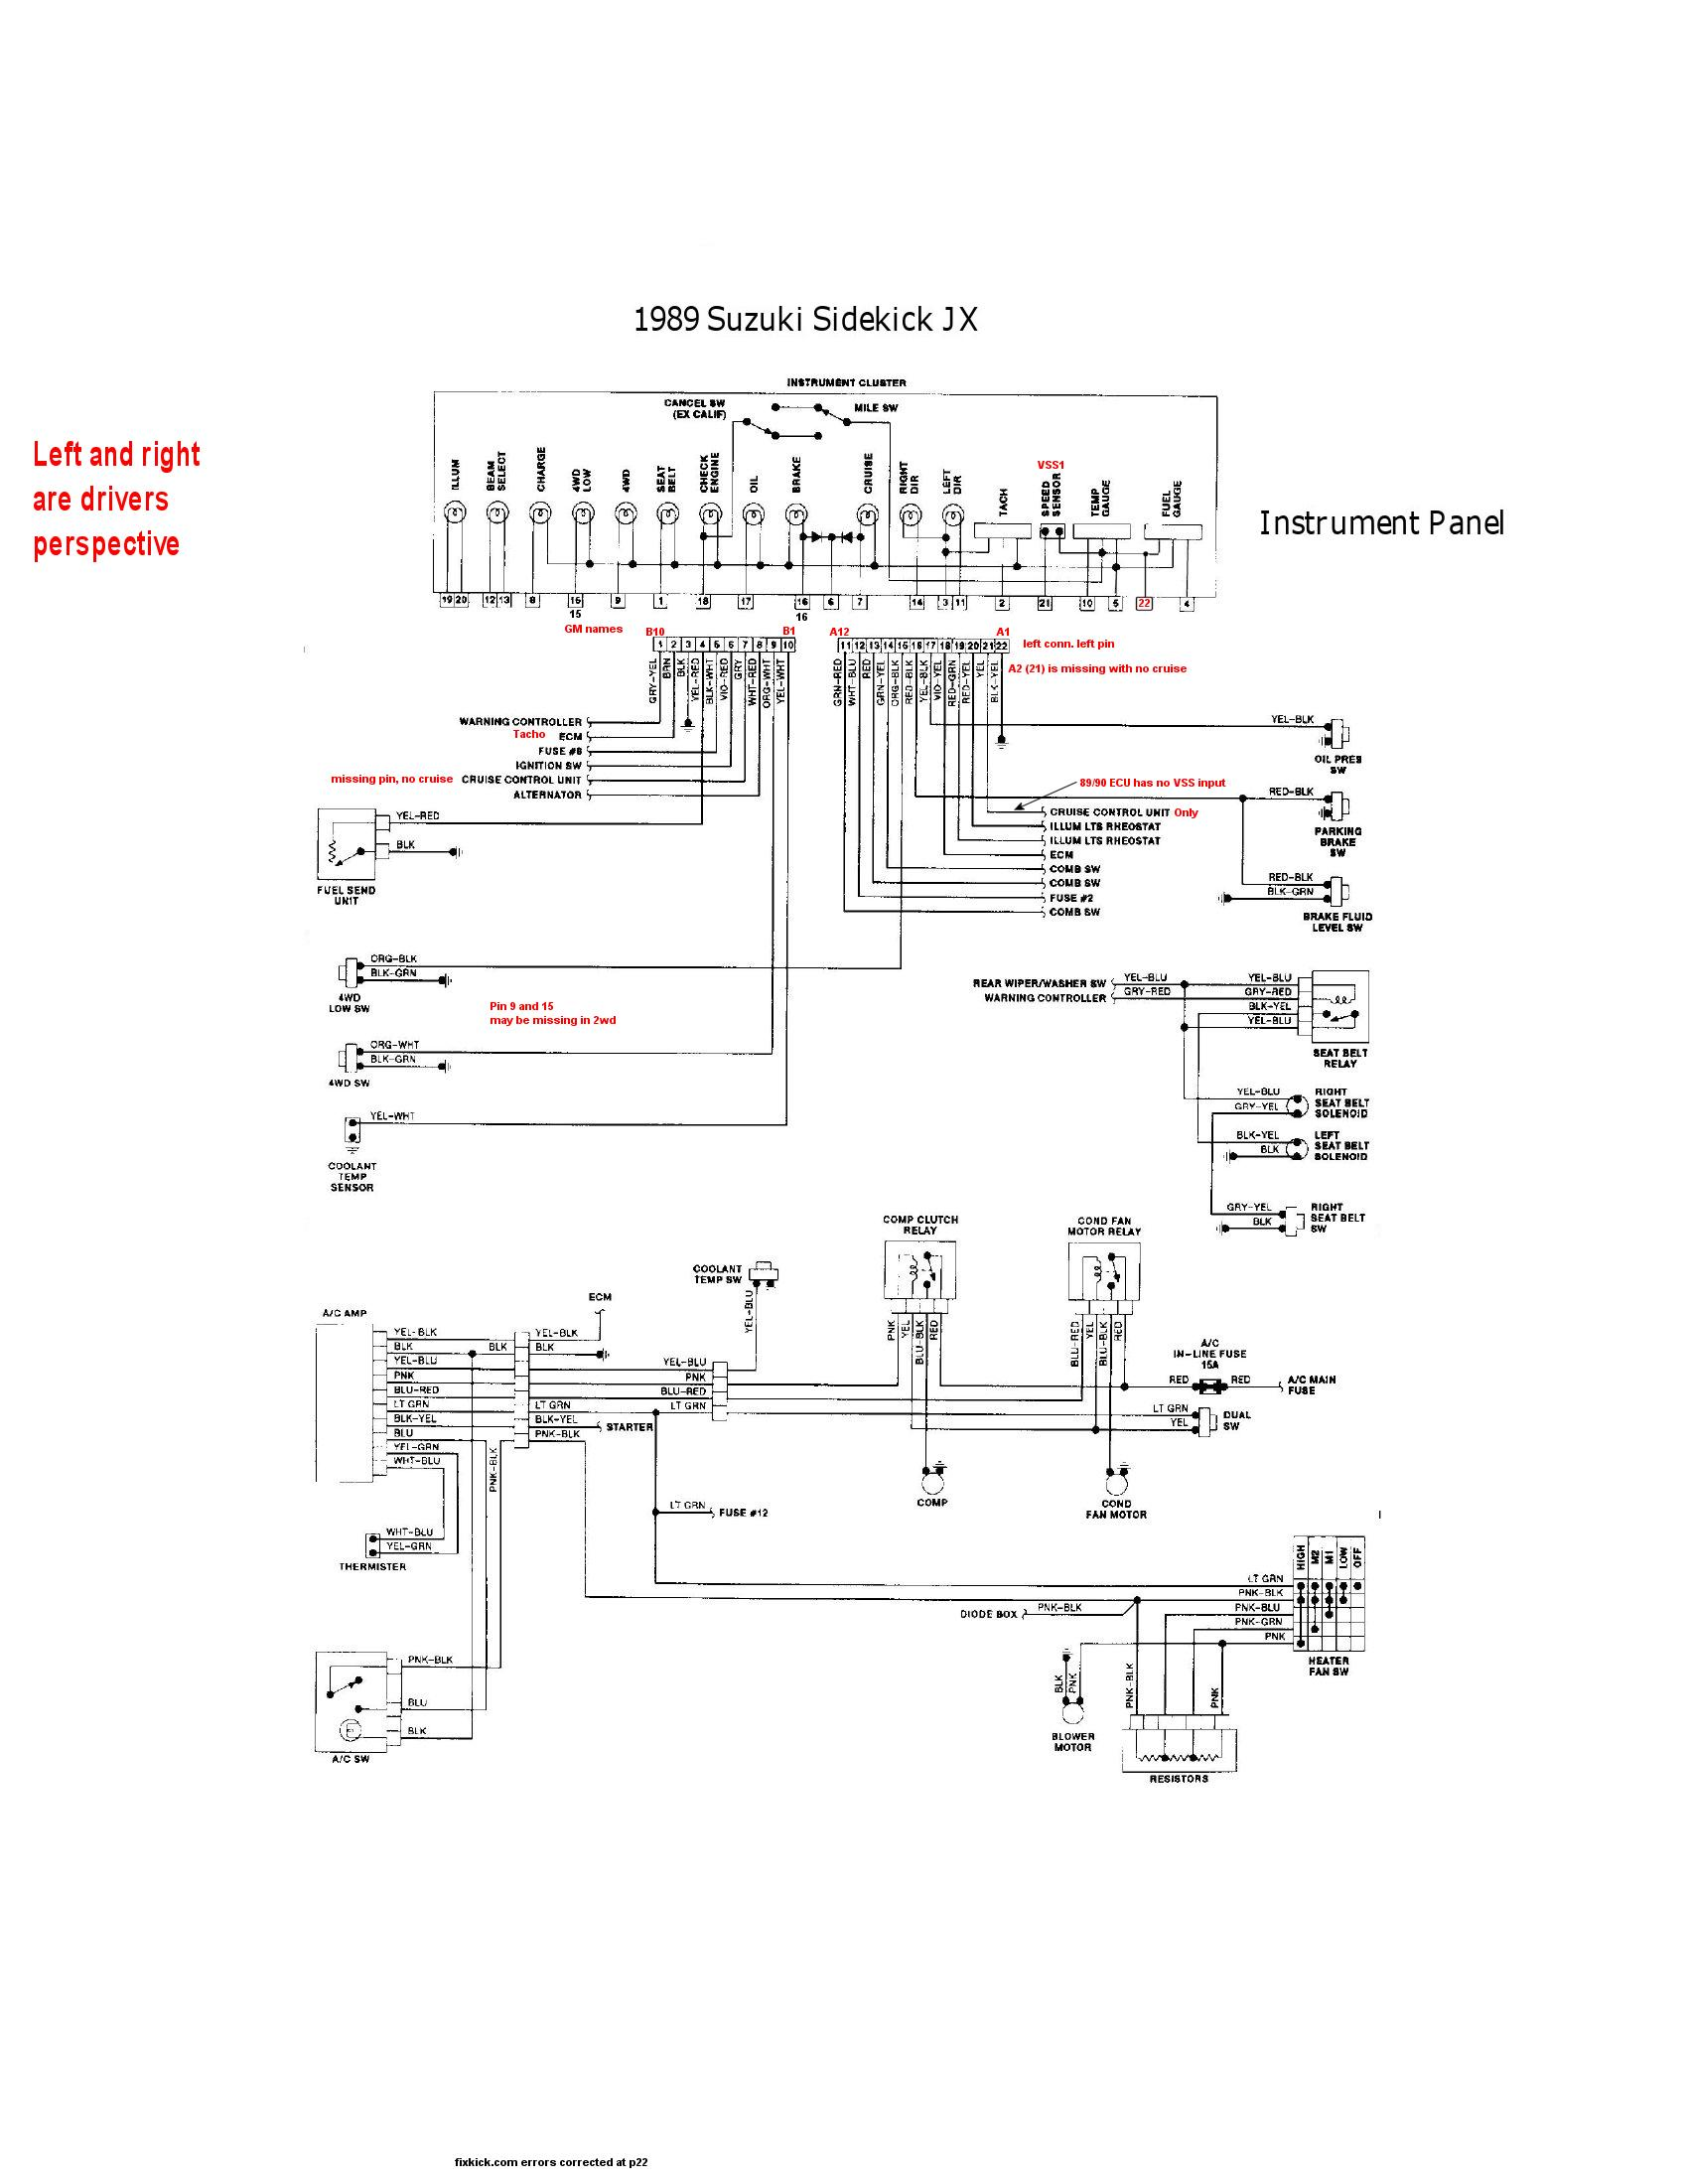 Suzuki Sidekick Wiring Diagram : Suzuki rv wiring diagram honda ft